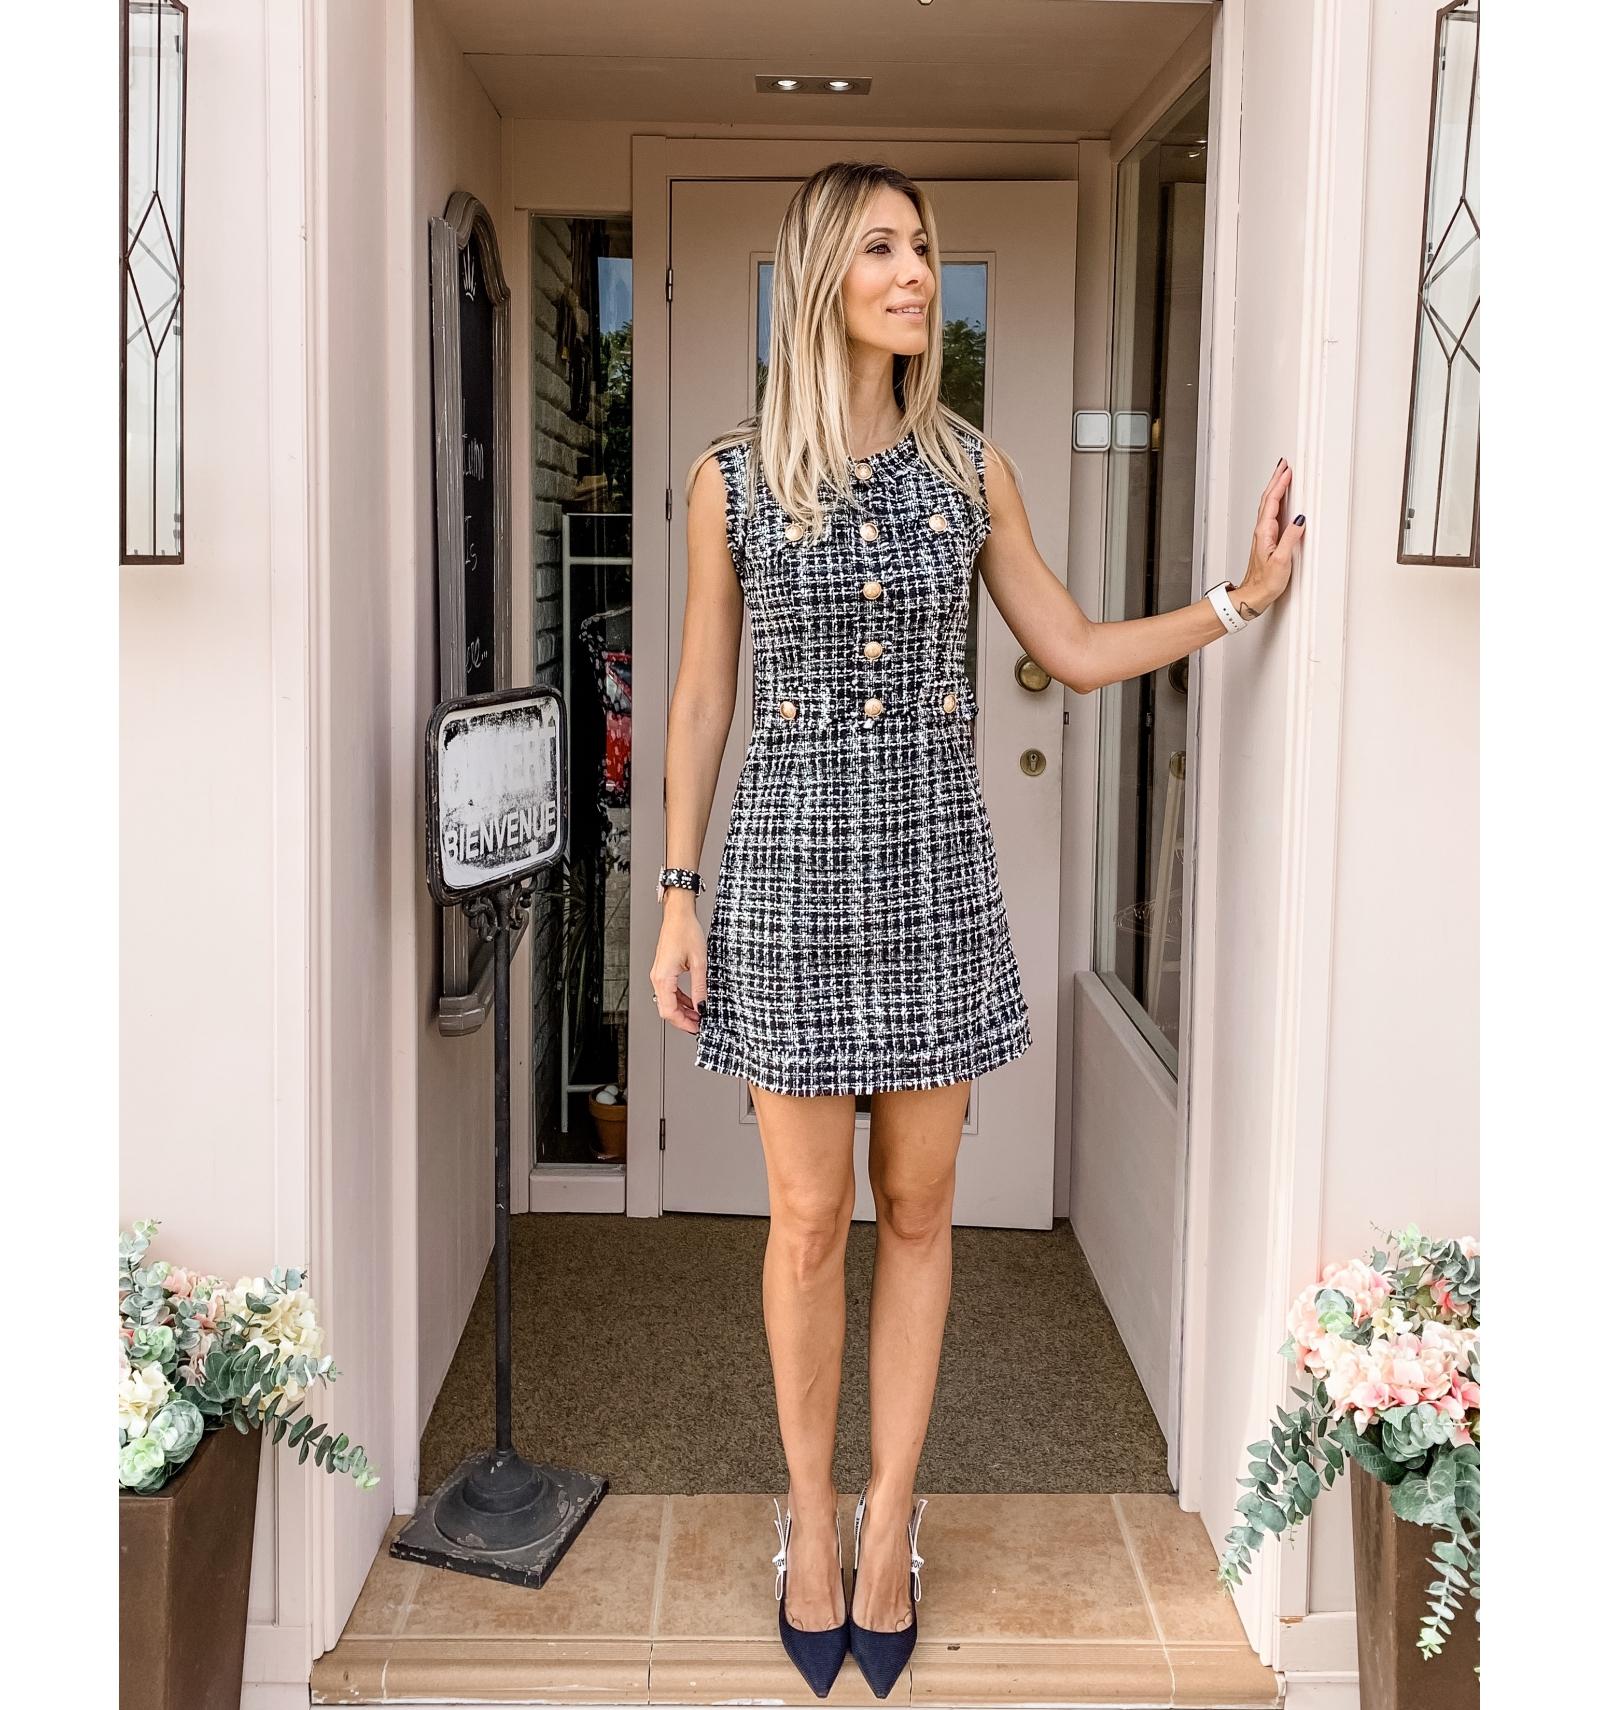 Vestido Corte Chanel Kukachic